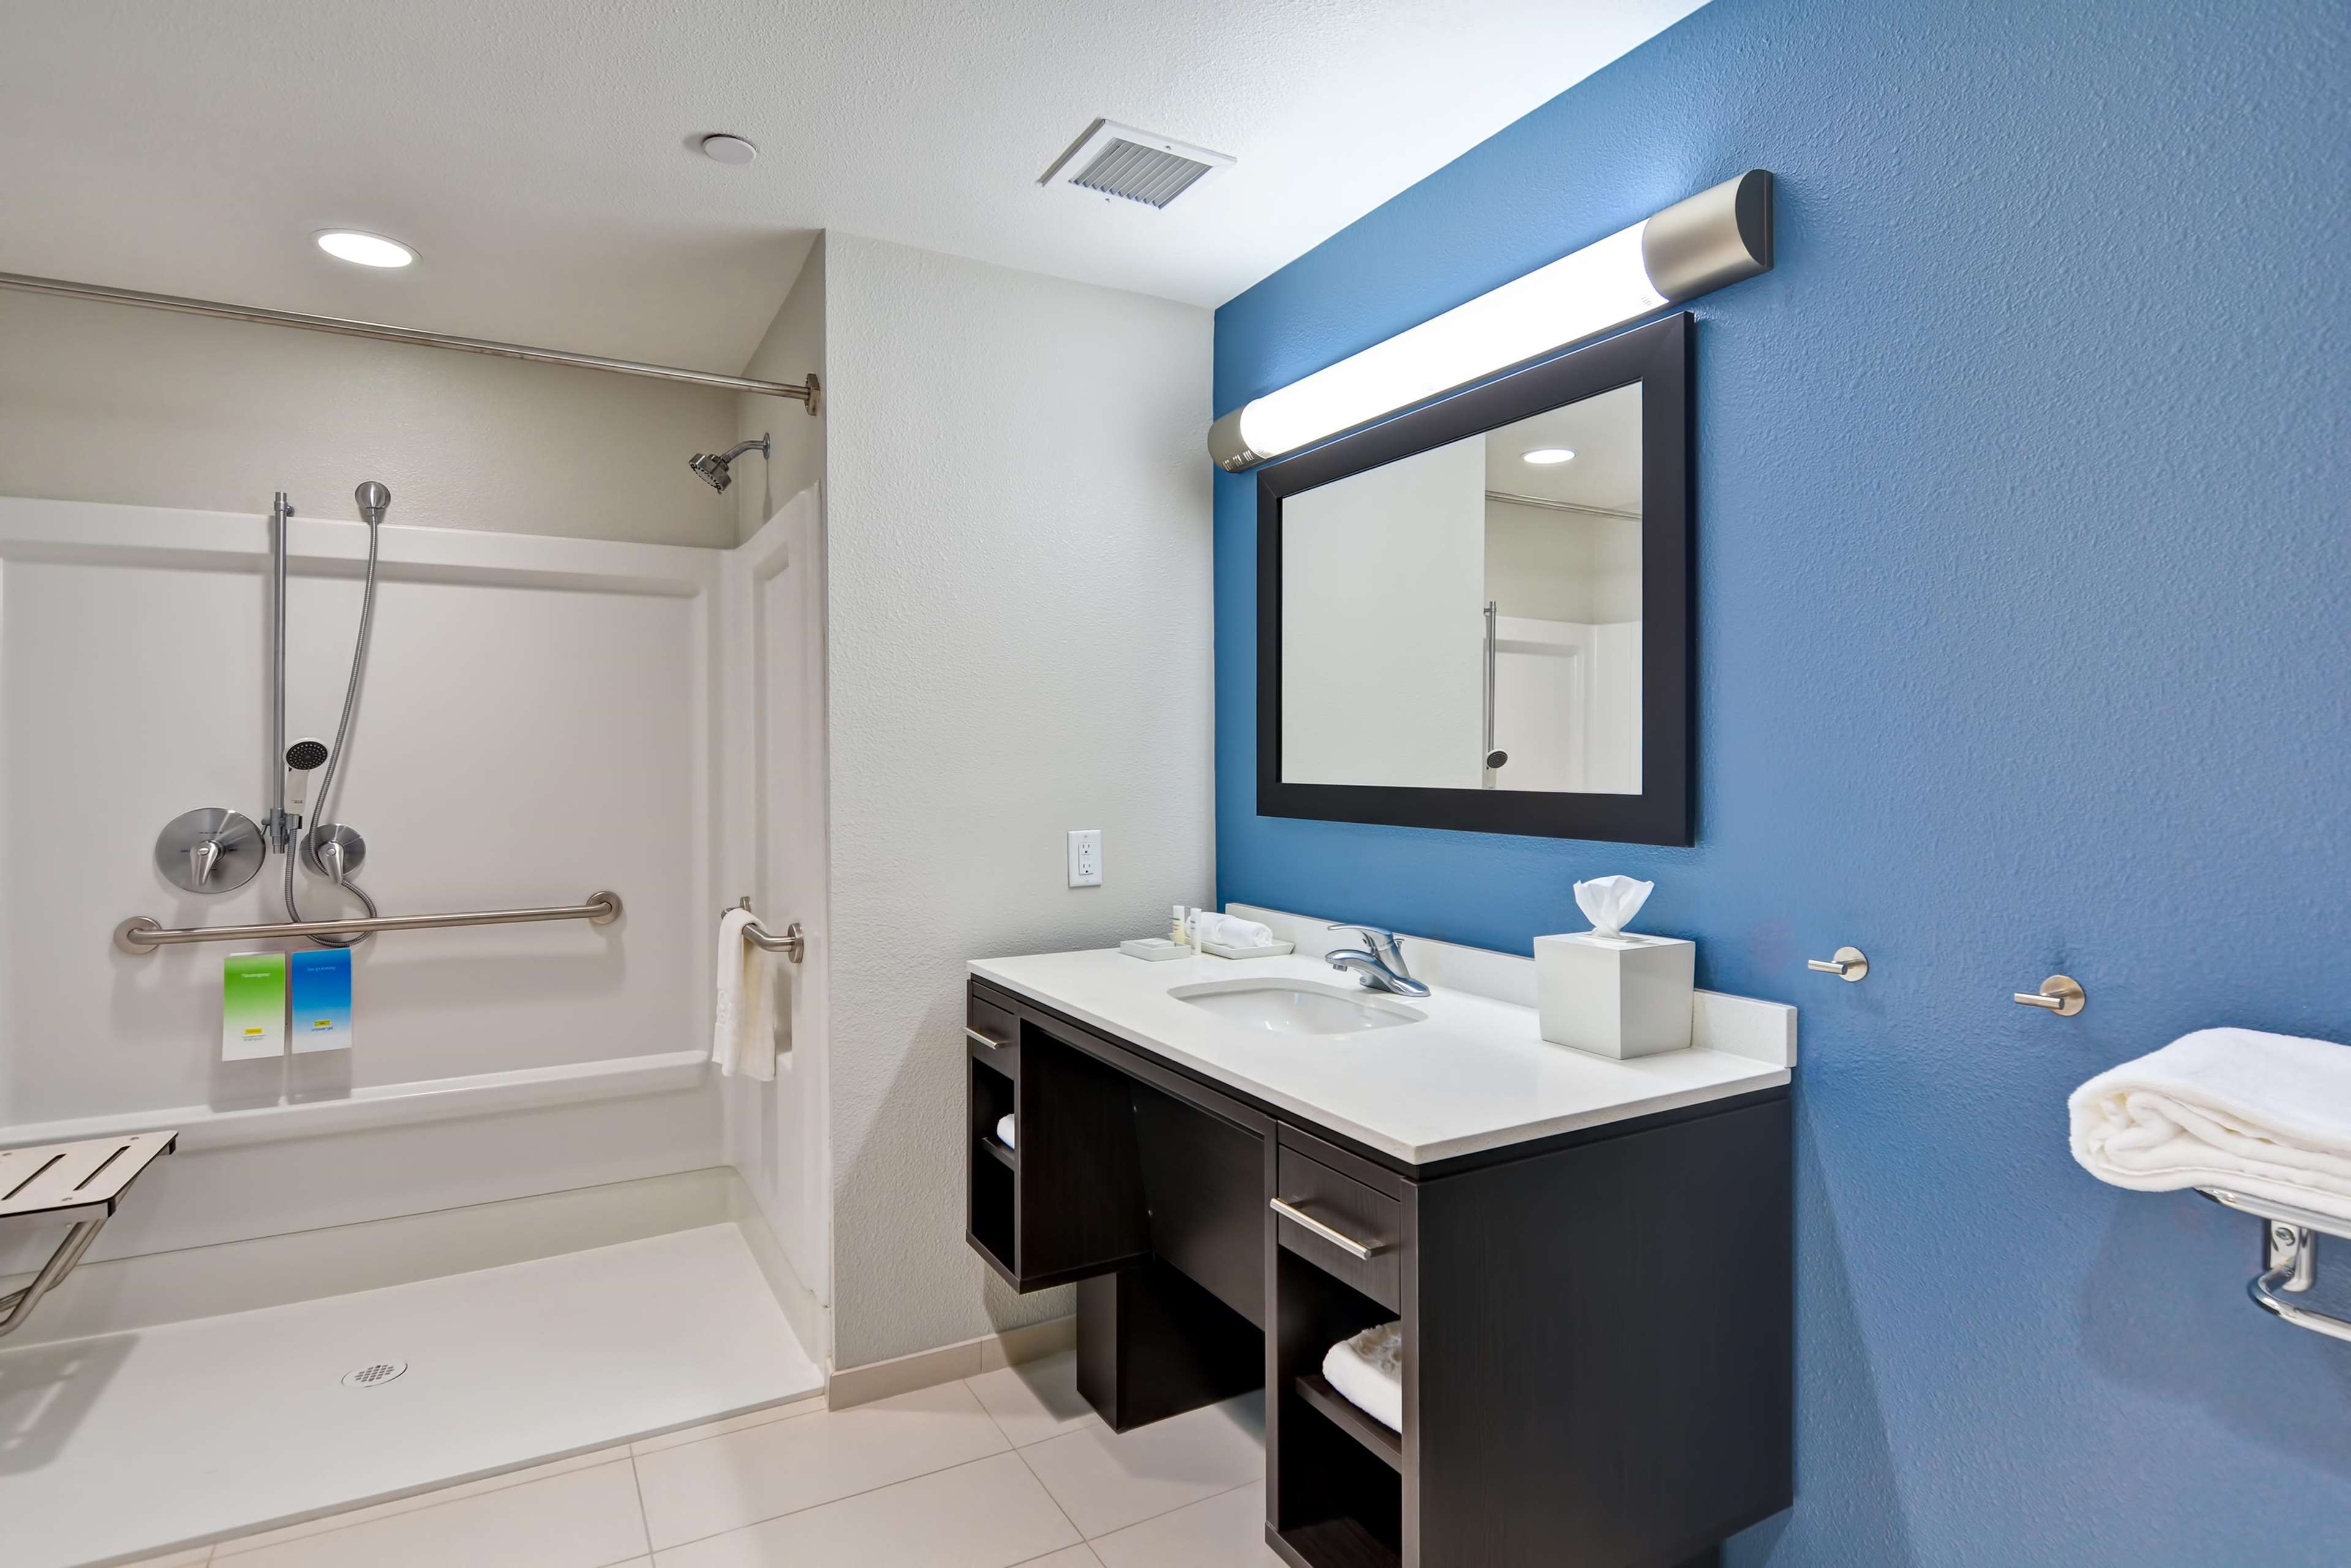 Home2 Suites by Hilton Azusa image 4